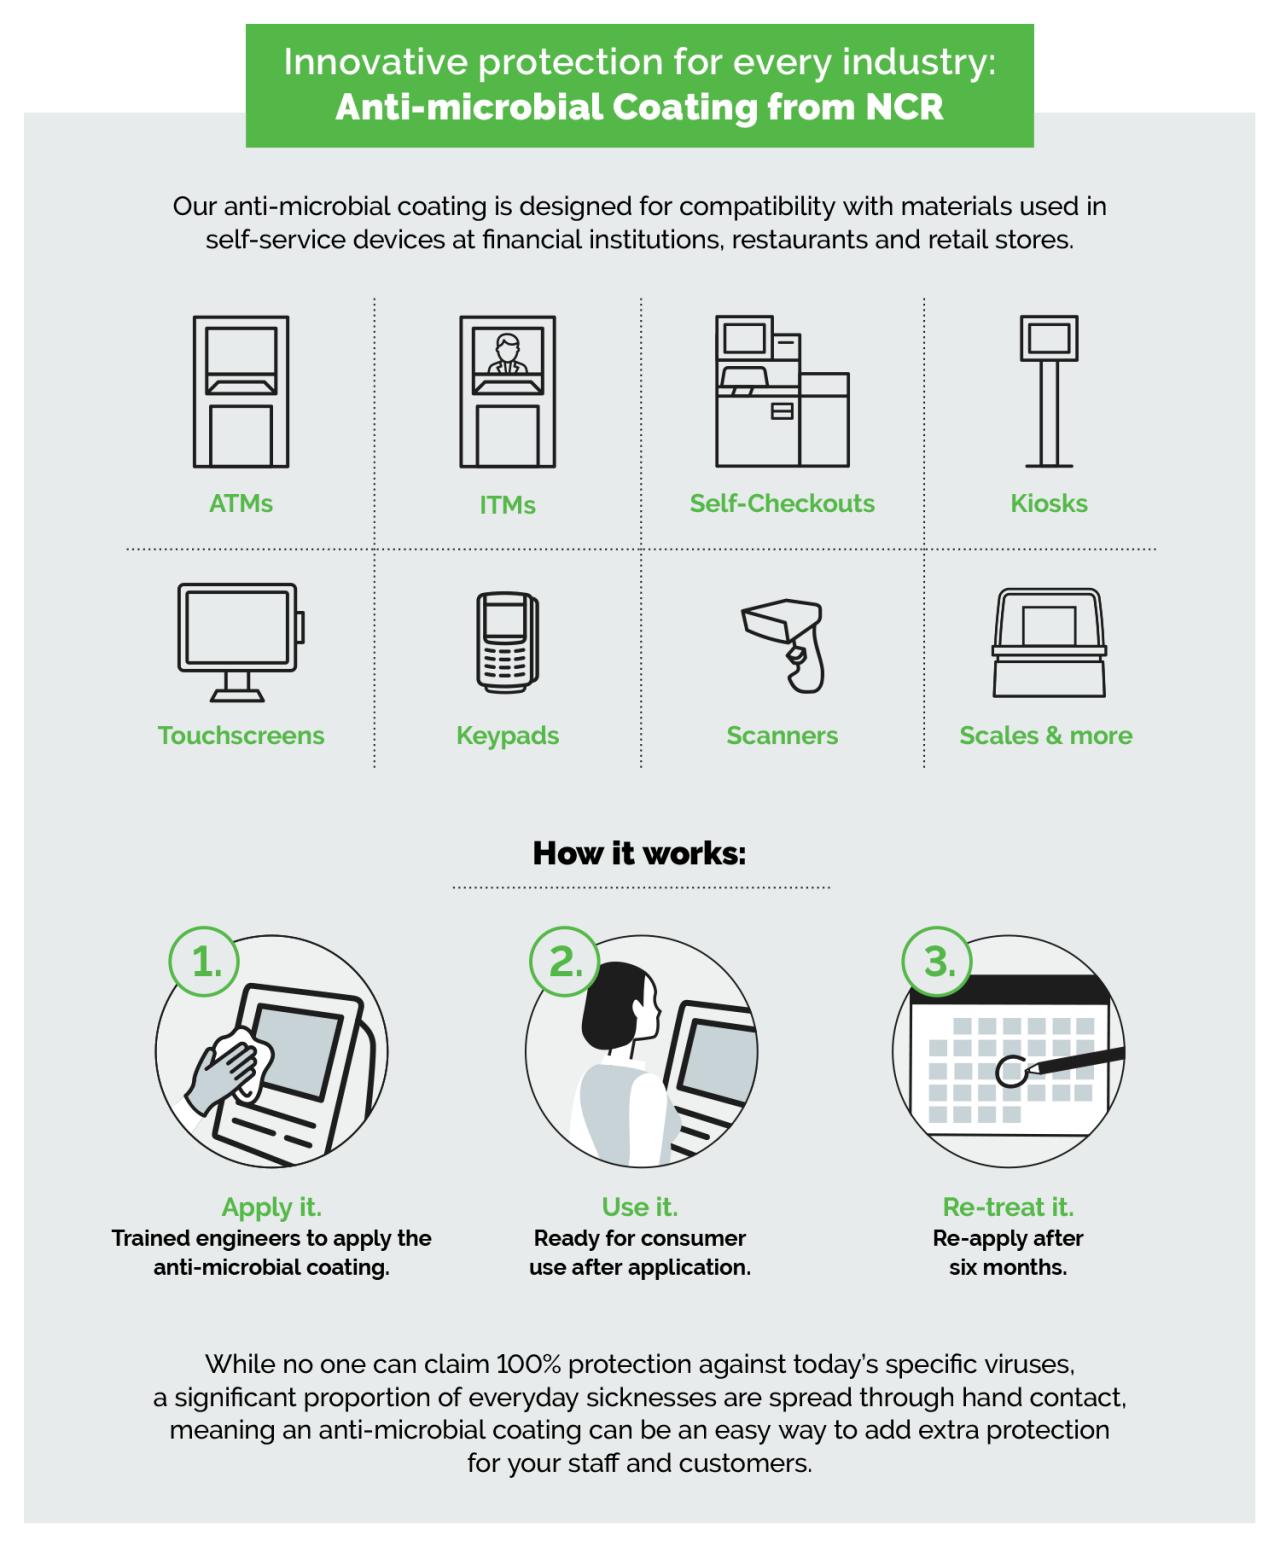 052820_ThePrimer_Banking_AntimicrobialProtection_Blog_Infographic_v5